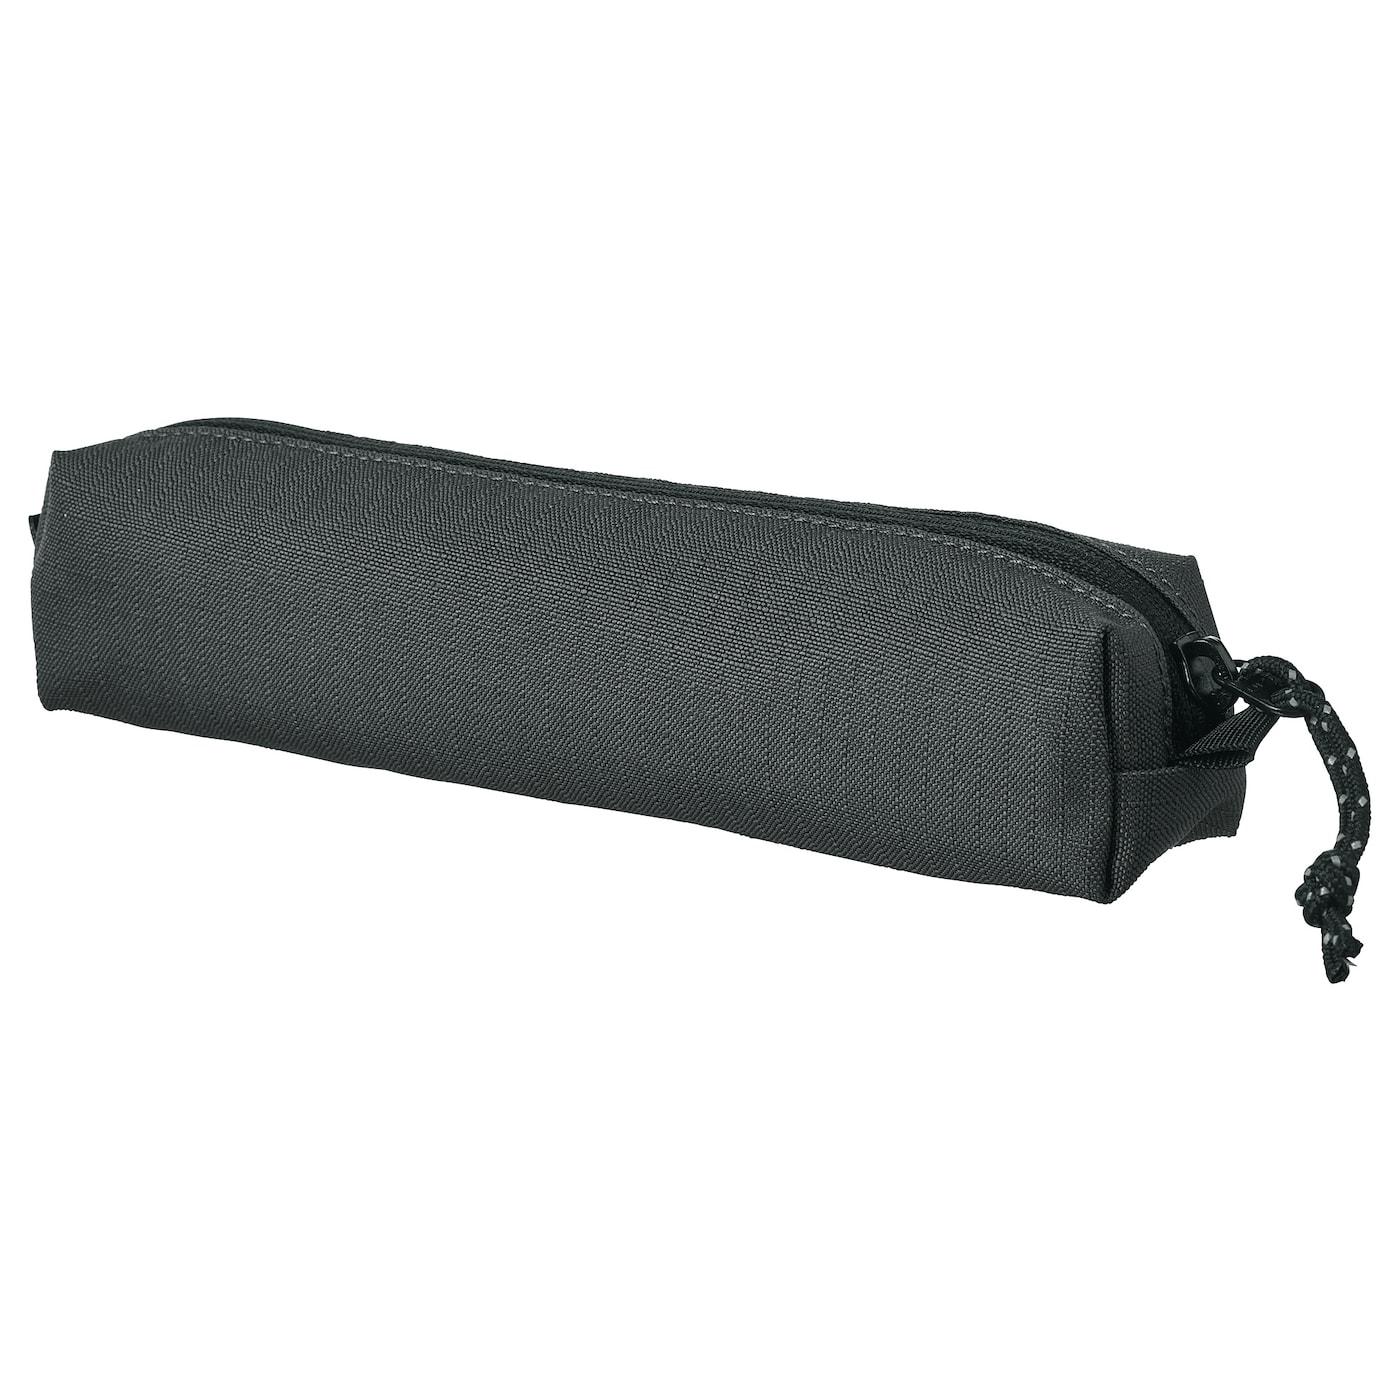 Världens Accessory Bag Dark Grey Small 21x4x4 Cm Ikea